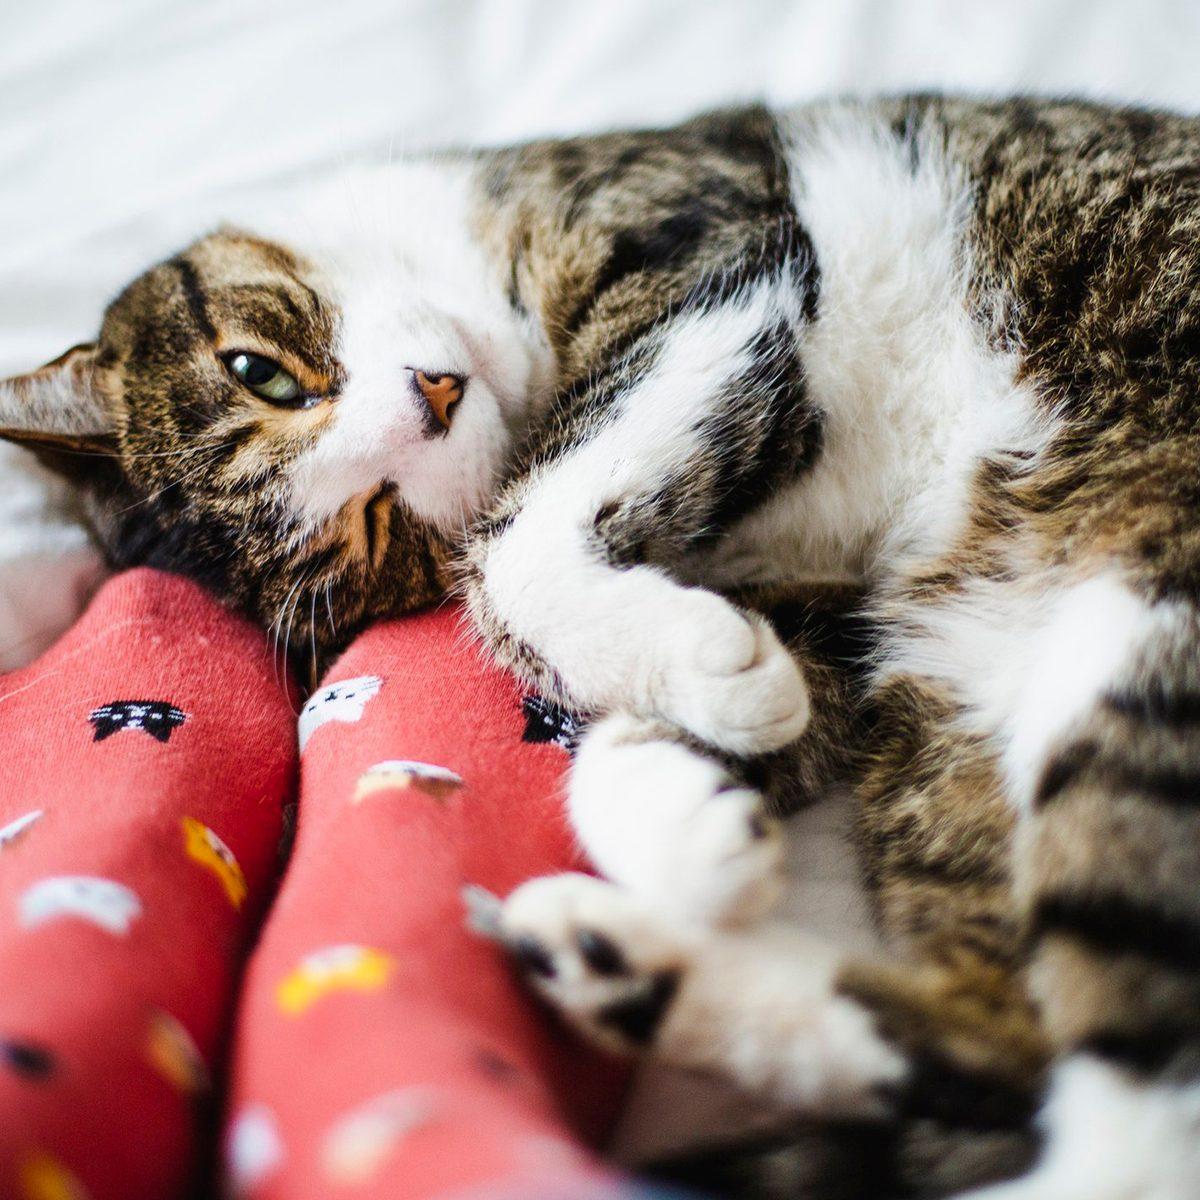 Cat cuddling by colorful socks